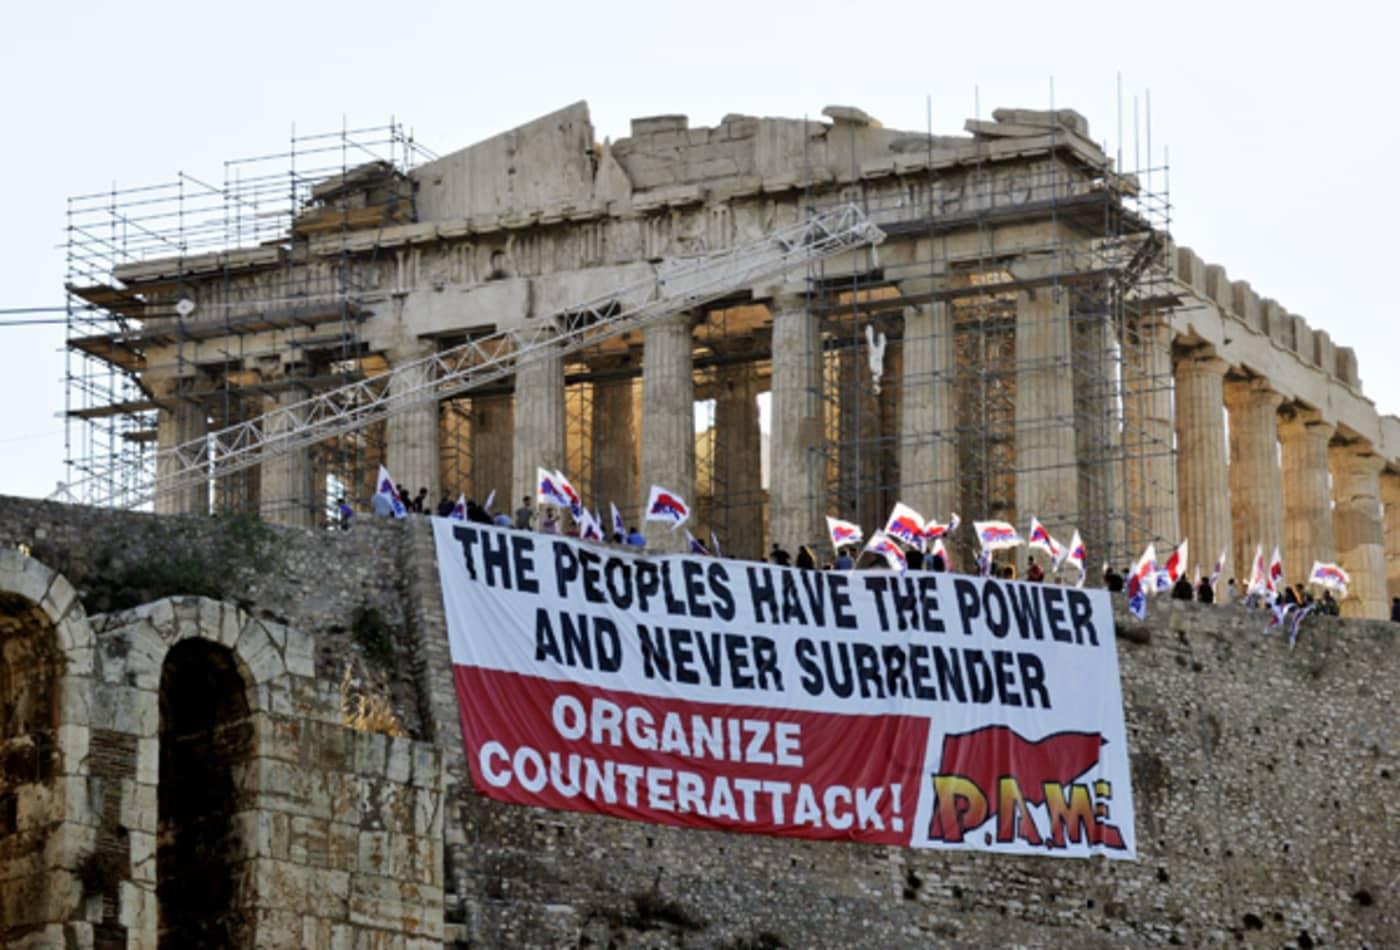 CNBC_Major_Events_Eurozone_Acropolis.jpg